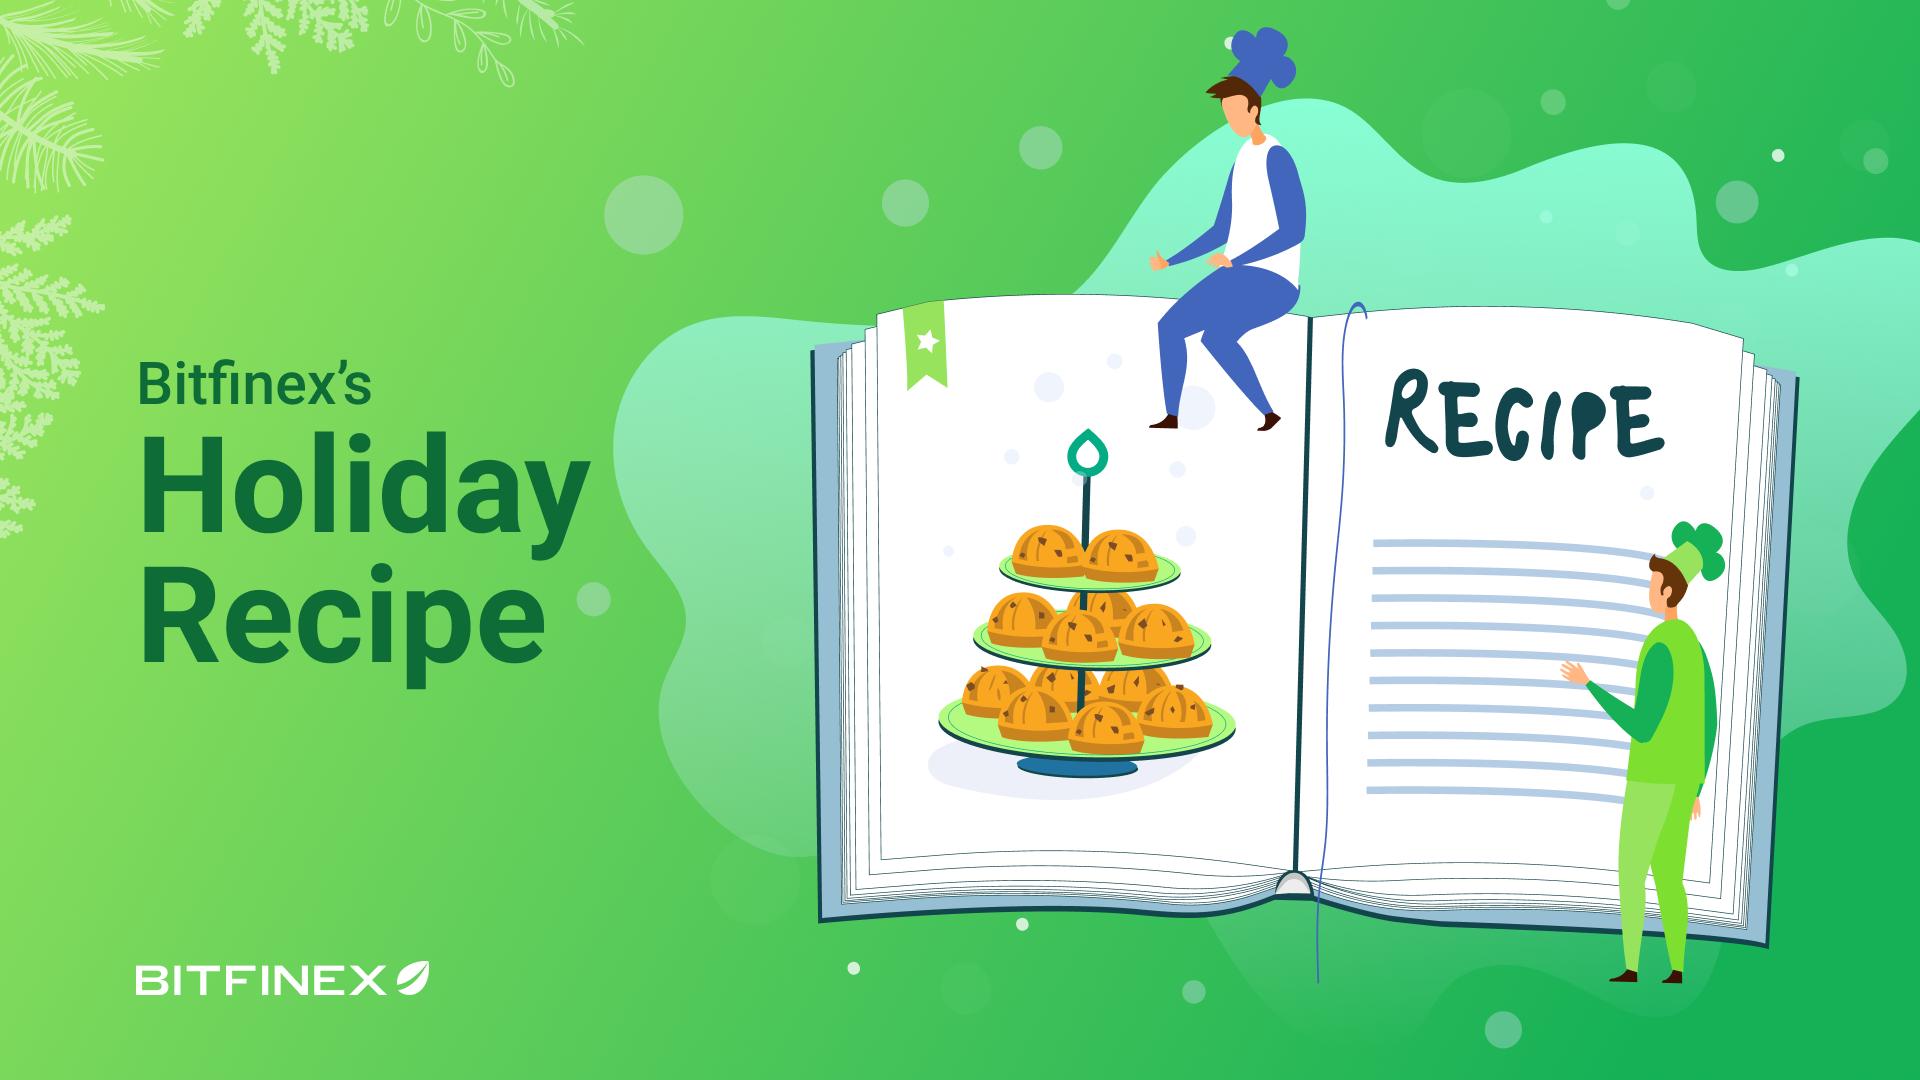 Bitfinex's perfect trader holiday recipe - Bitfinex blog